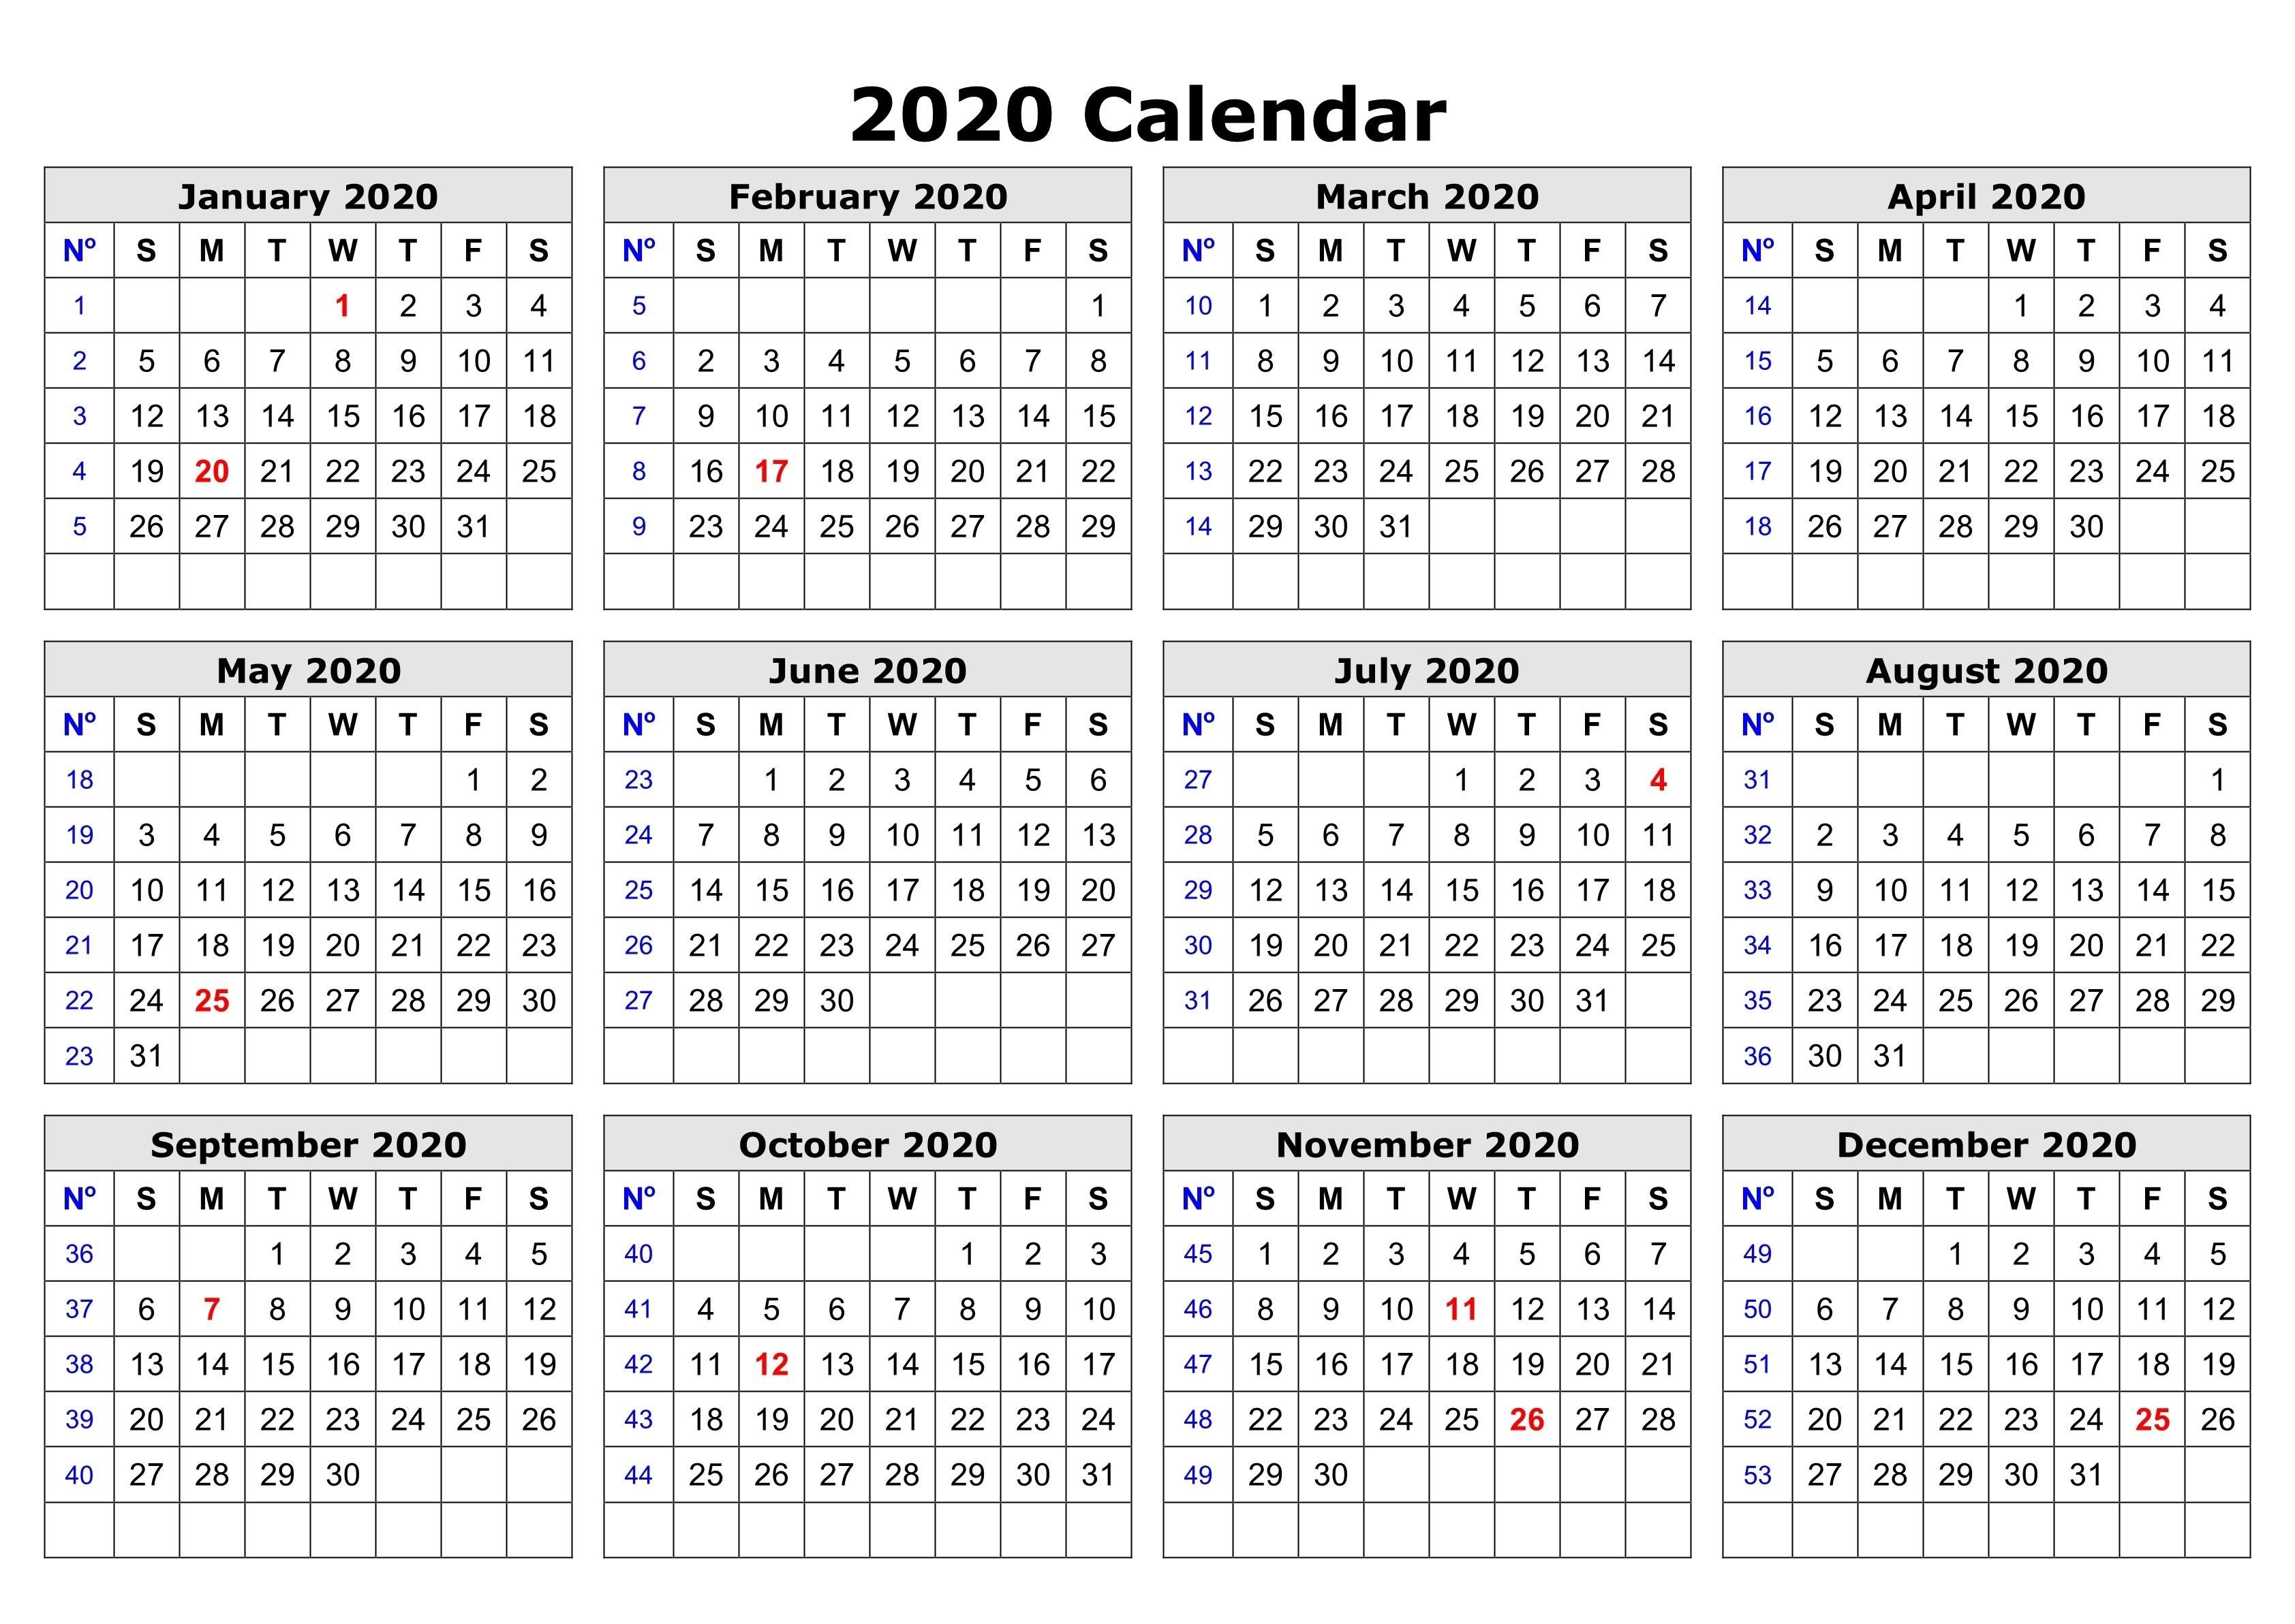 2020 Calendar Printable One Page 2020 E Page Calendar Printable